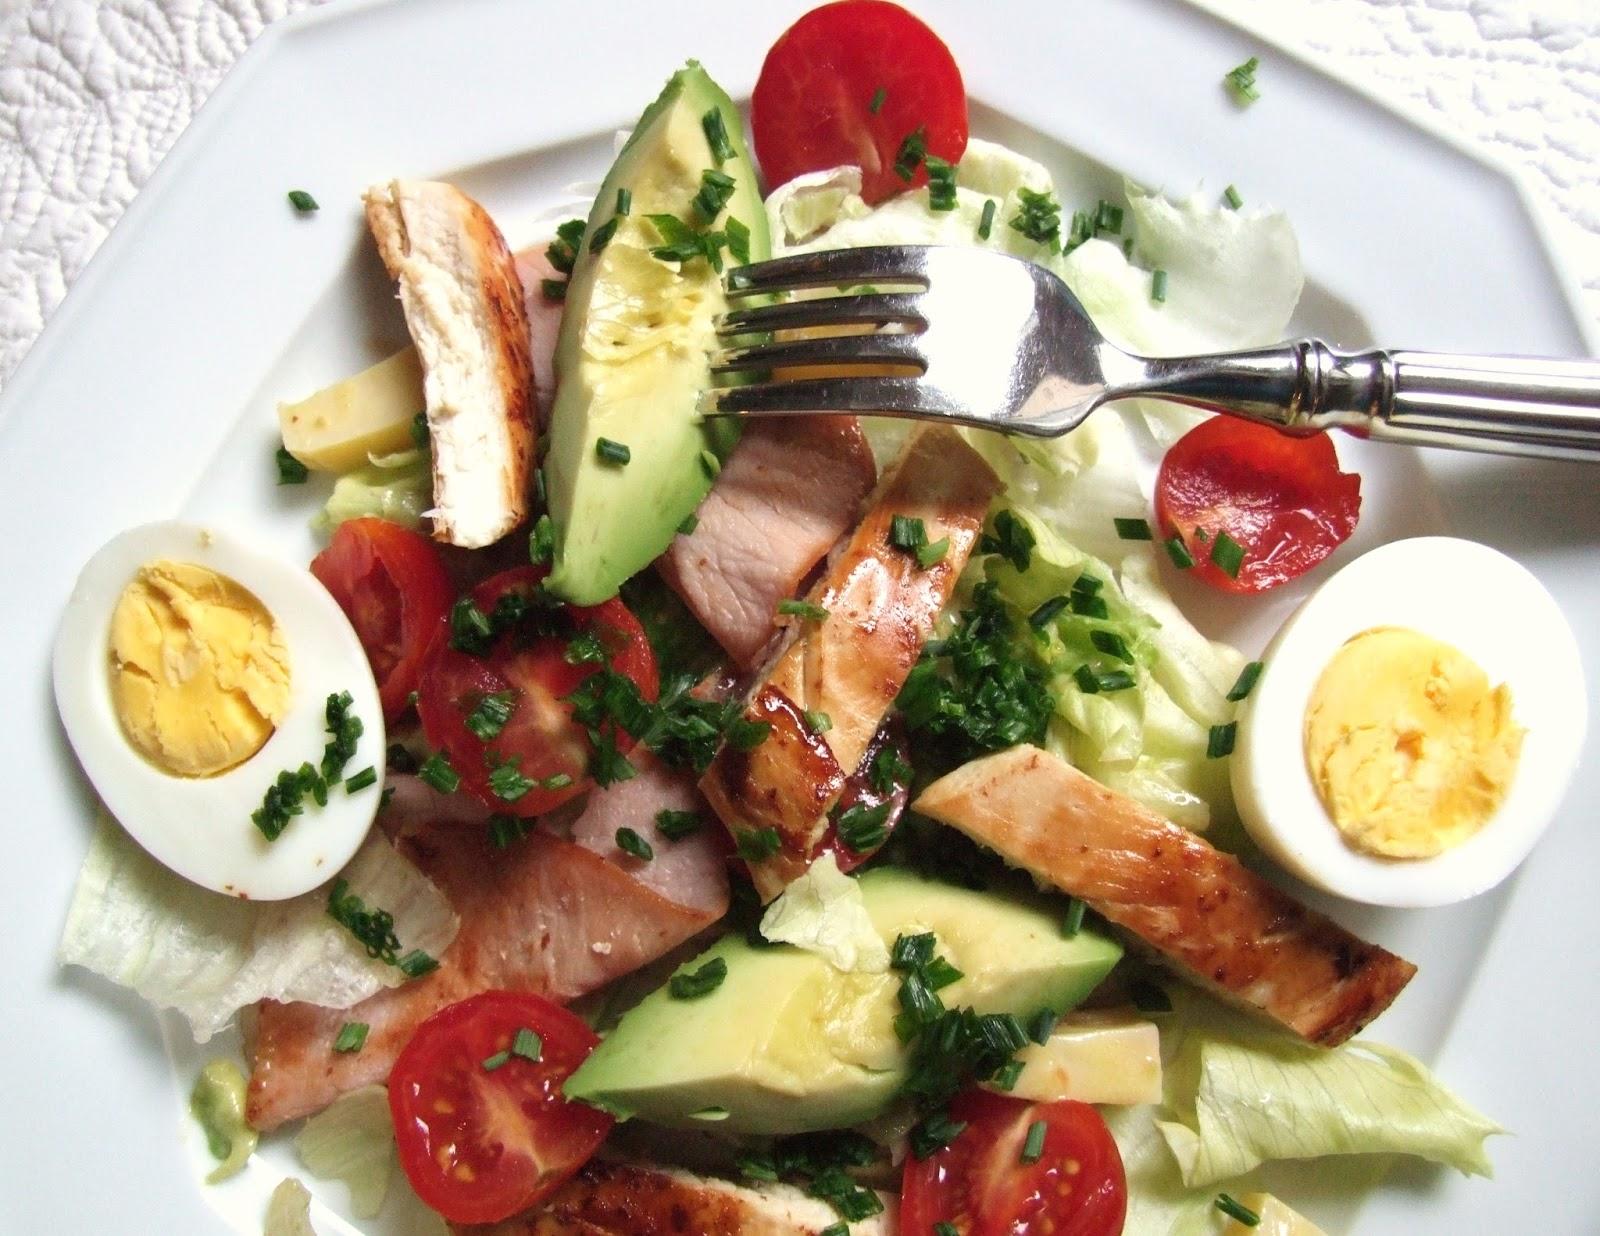 cobb salad cobb salad a 500 jpg # cobb 20salad cobb salad jpg # cobb ...